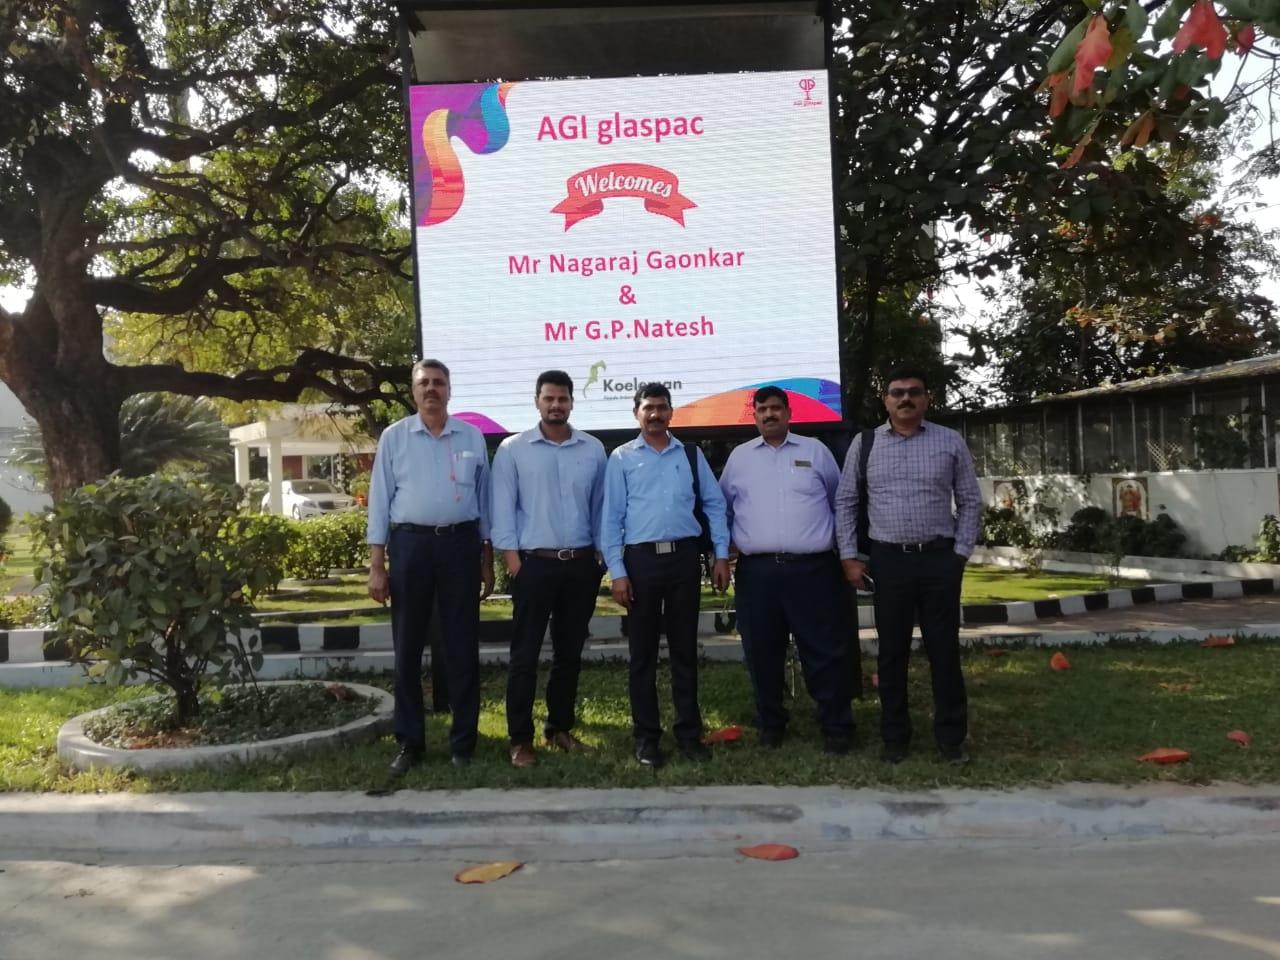 Nagaraj Gaonkar先生和克对Natesh先生Koeleman